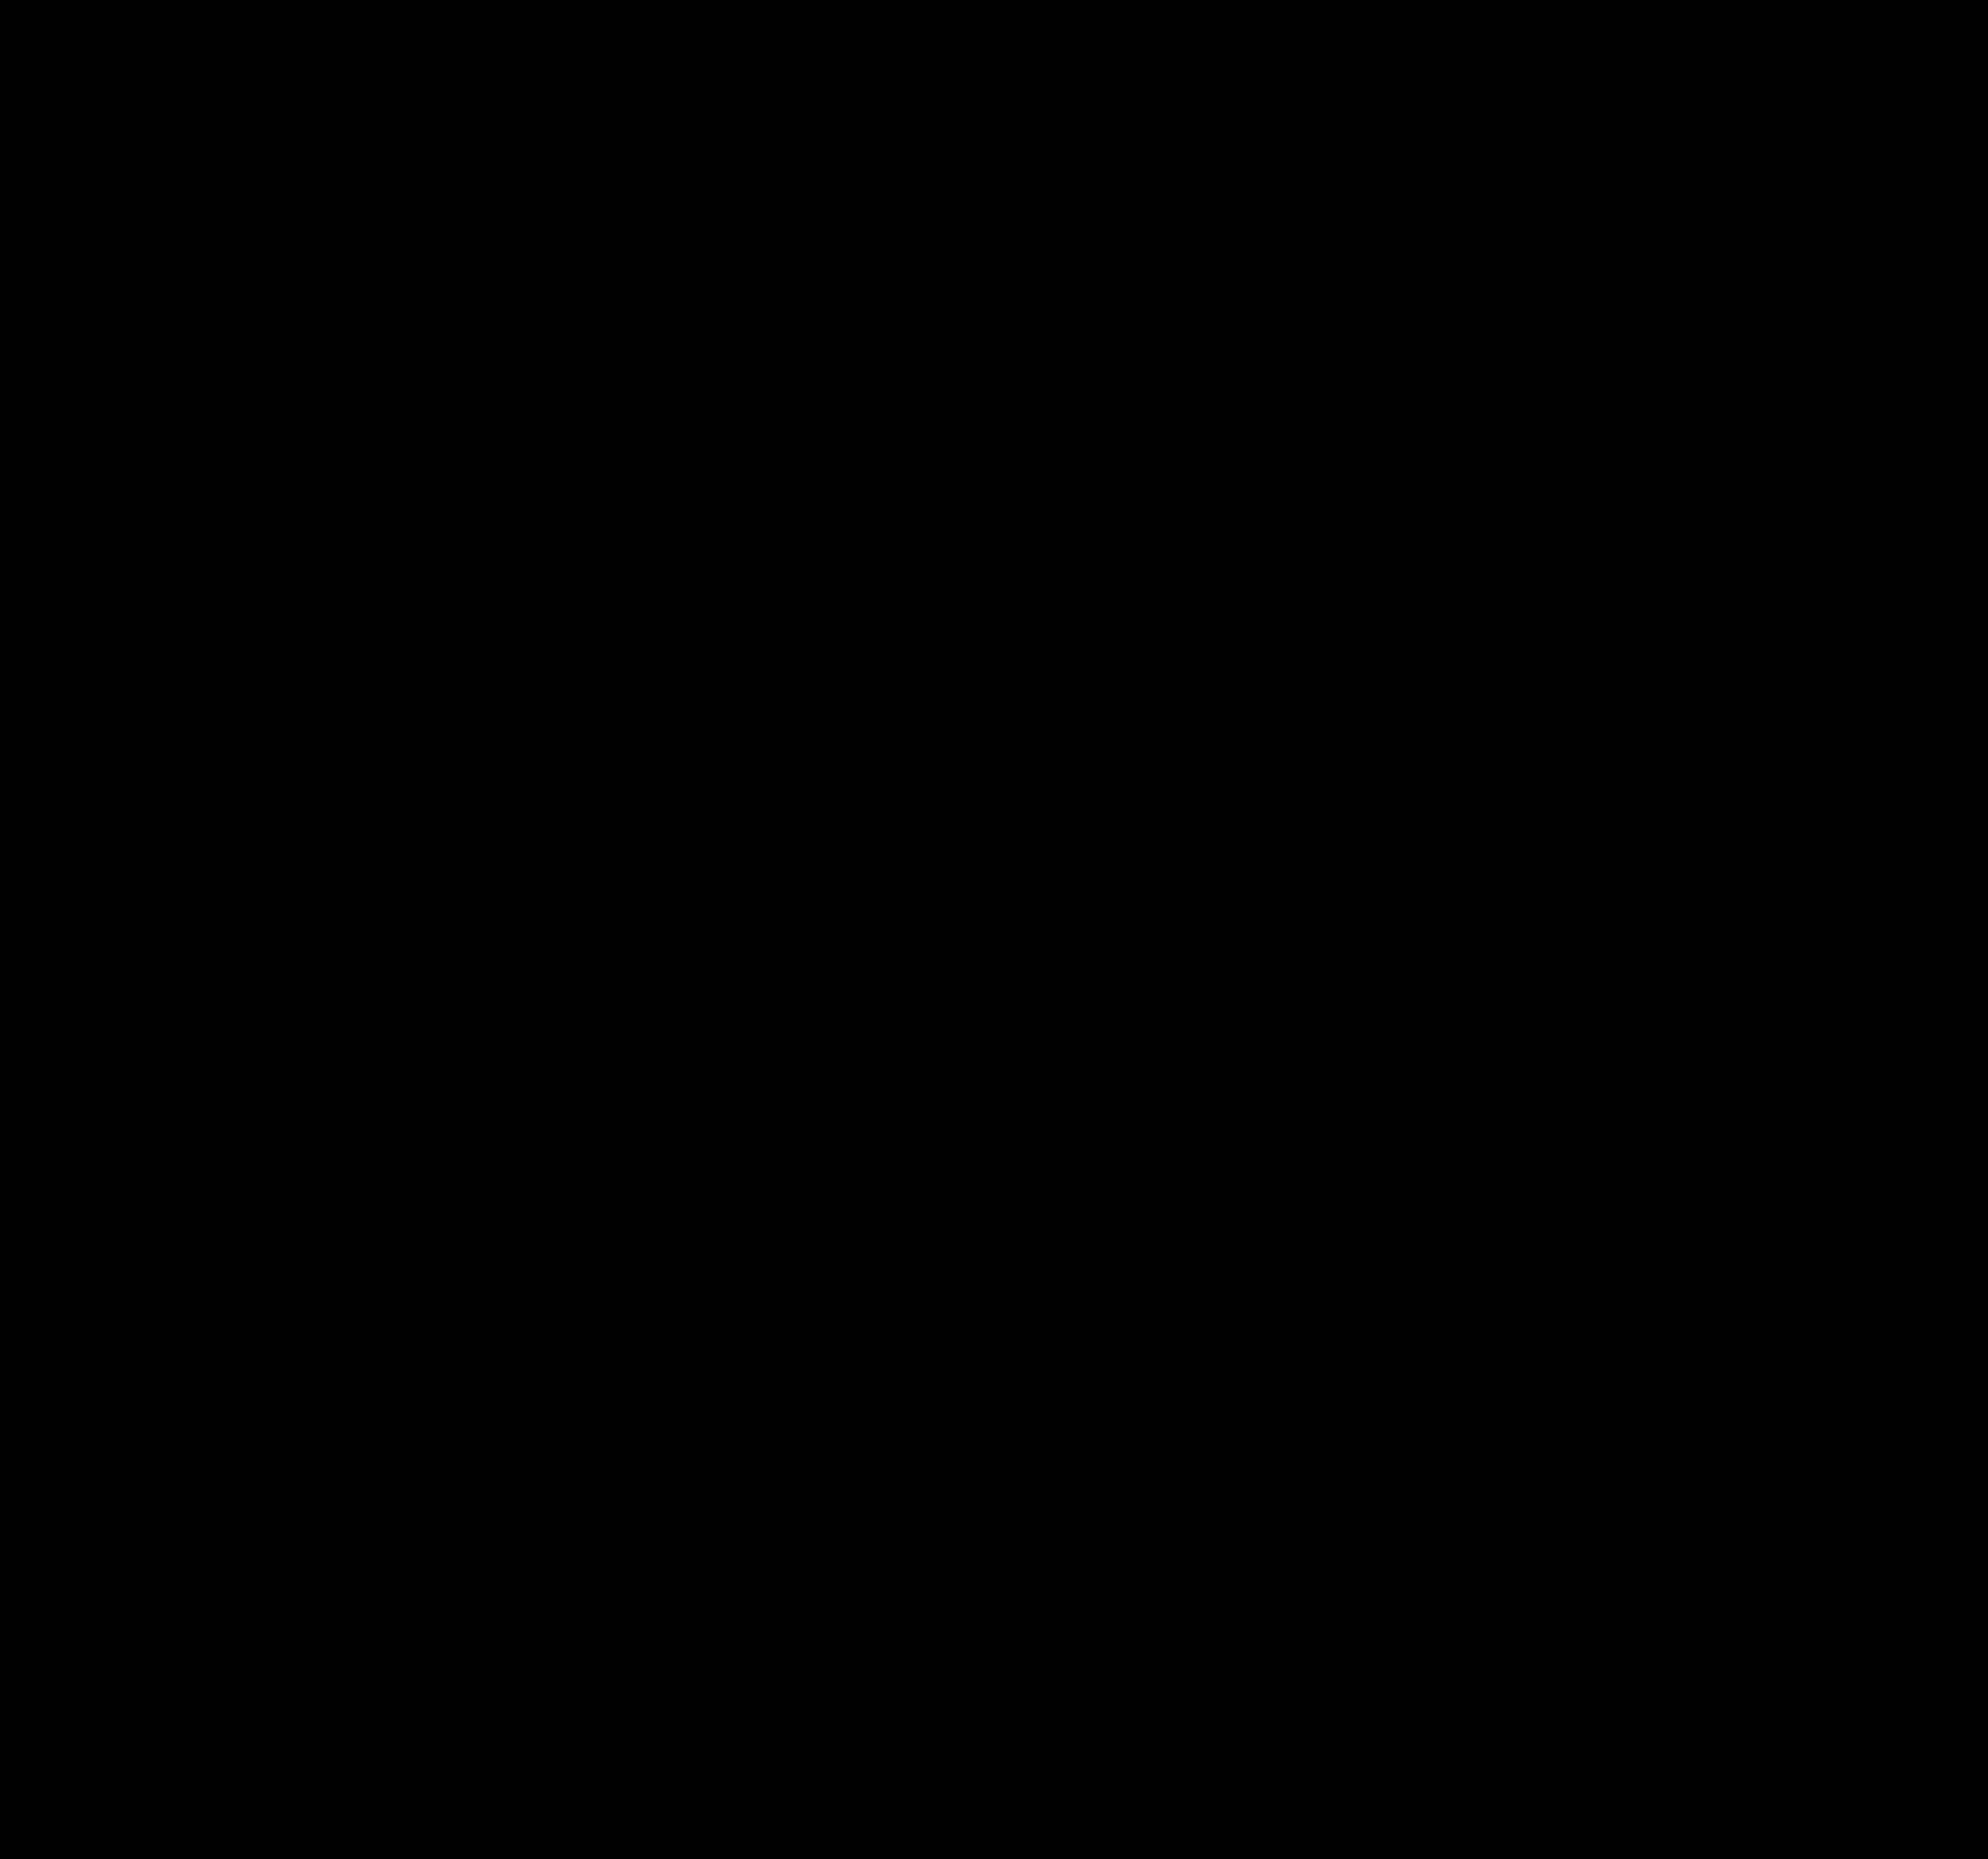 logo-black (1).png